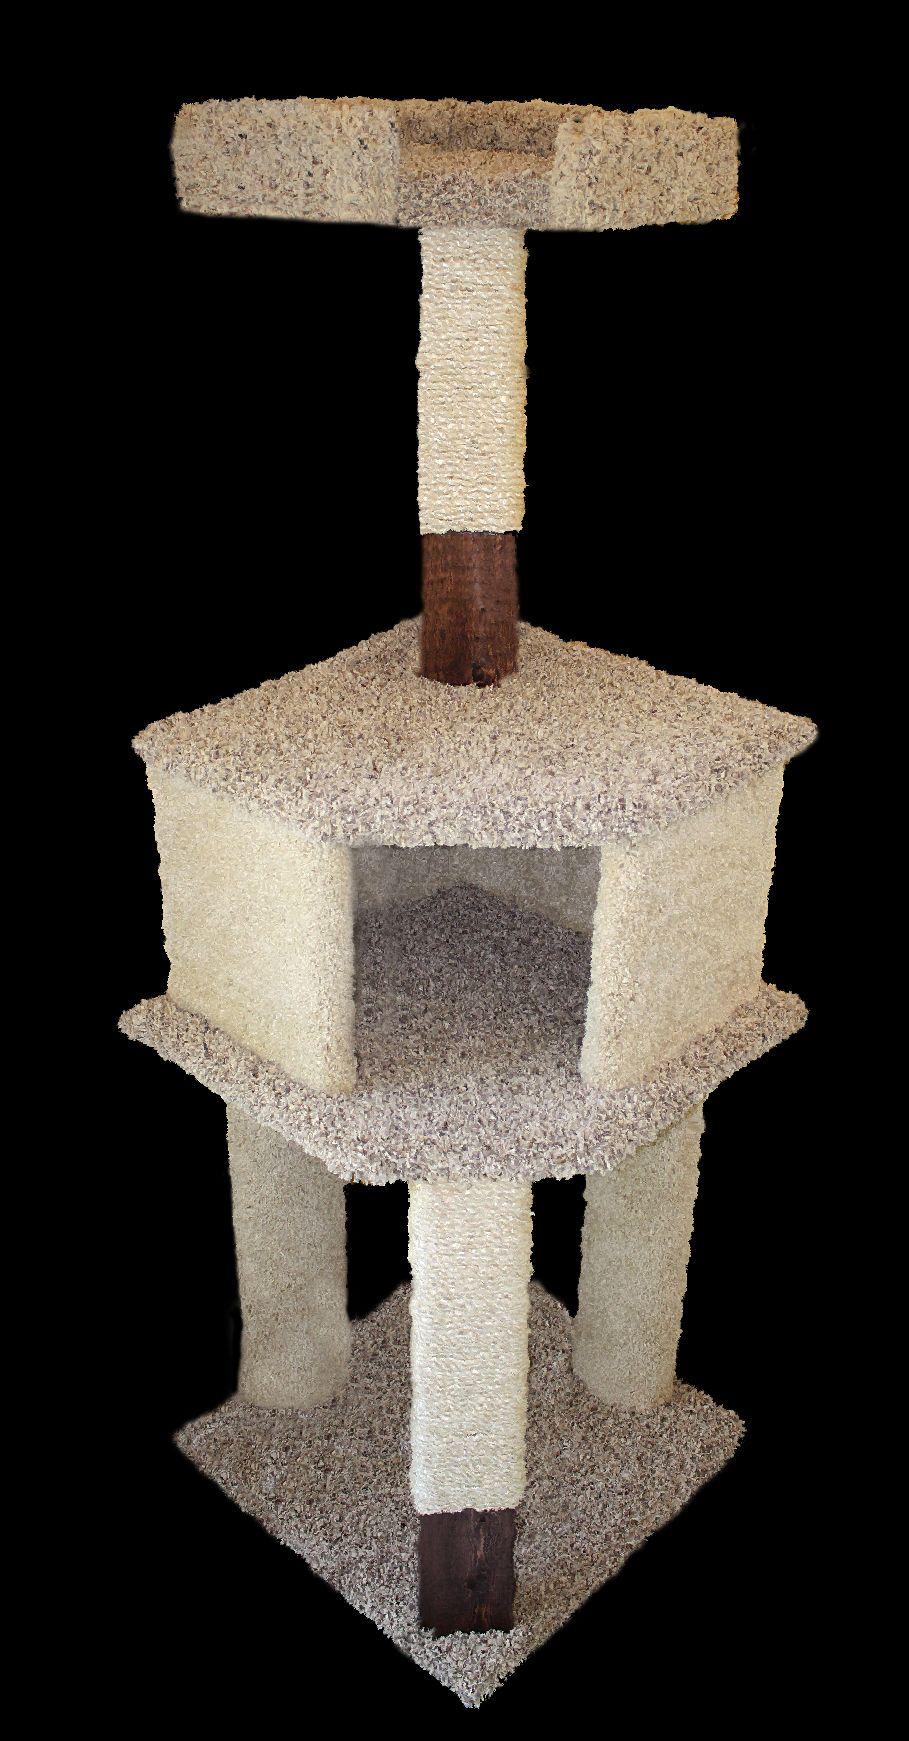 webassets cat condo black 2 jpg  cattower   more about cat tower at   catsincare  webassets cat condo black 2 jpg  cattower   more about cat tower      rh   pinterest